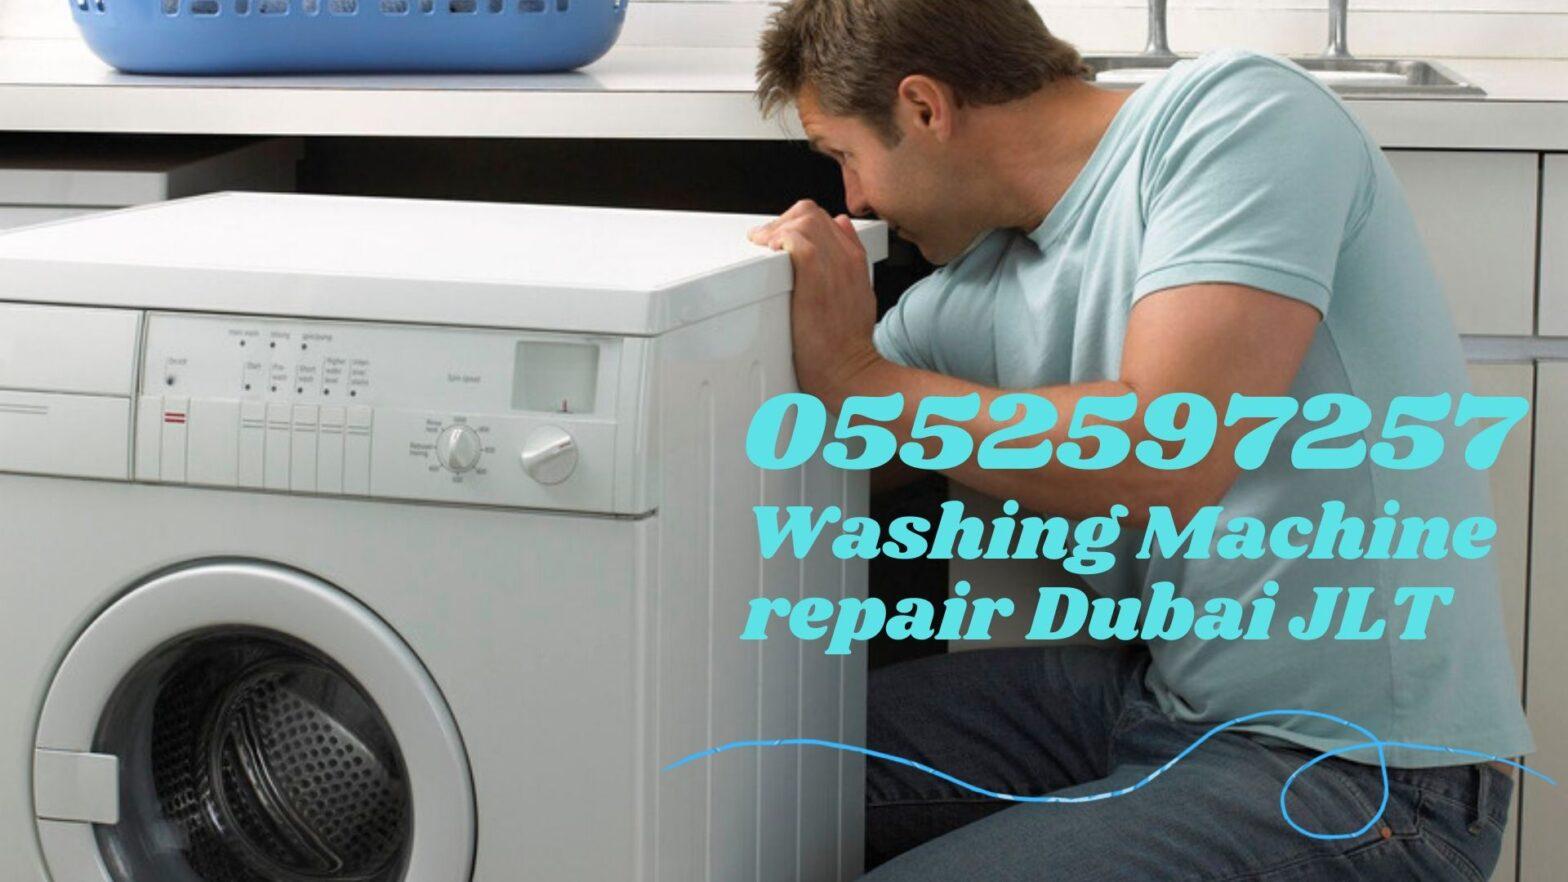 Washing machine repair Dubai JLT